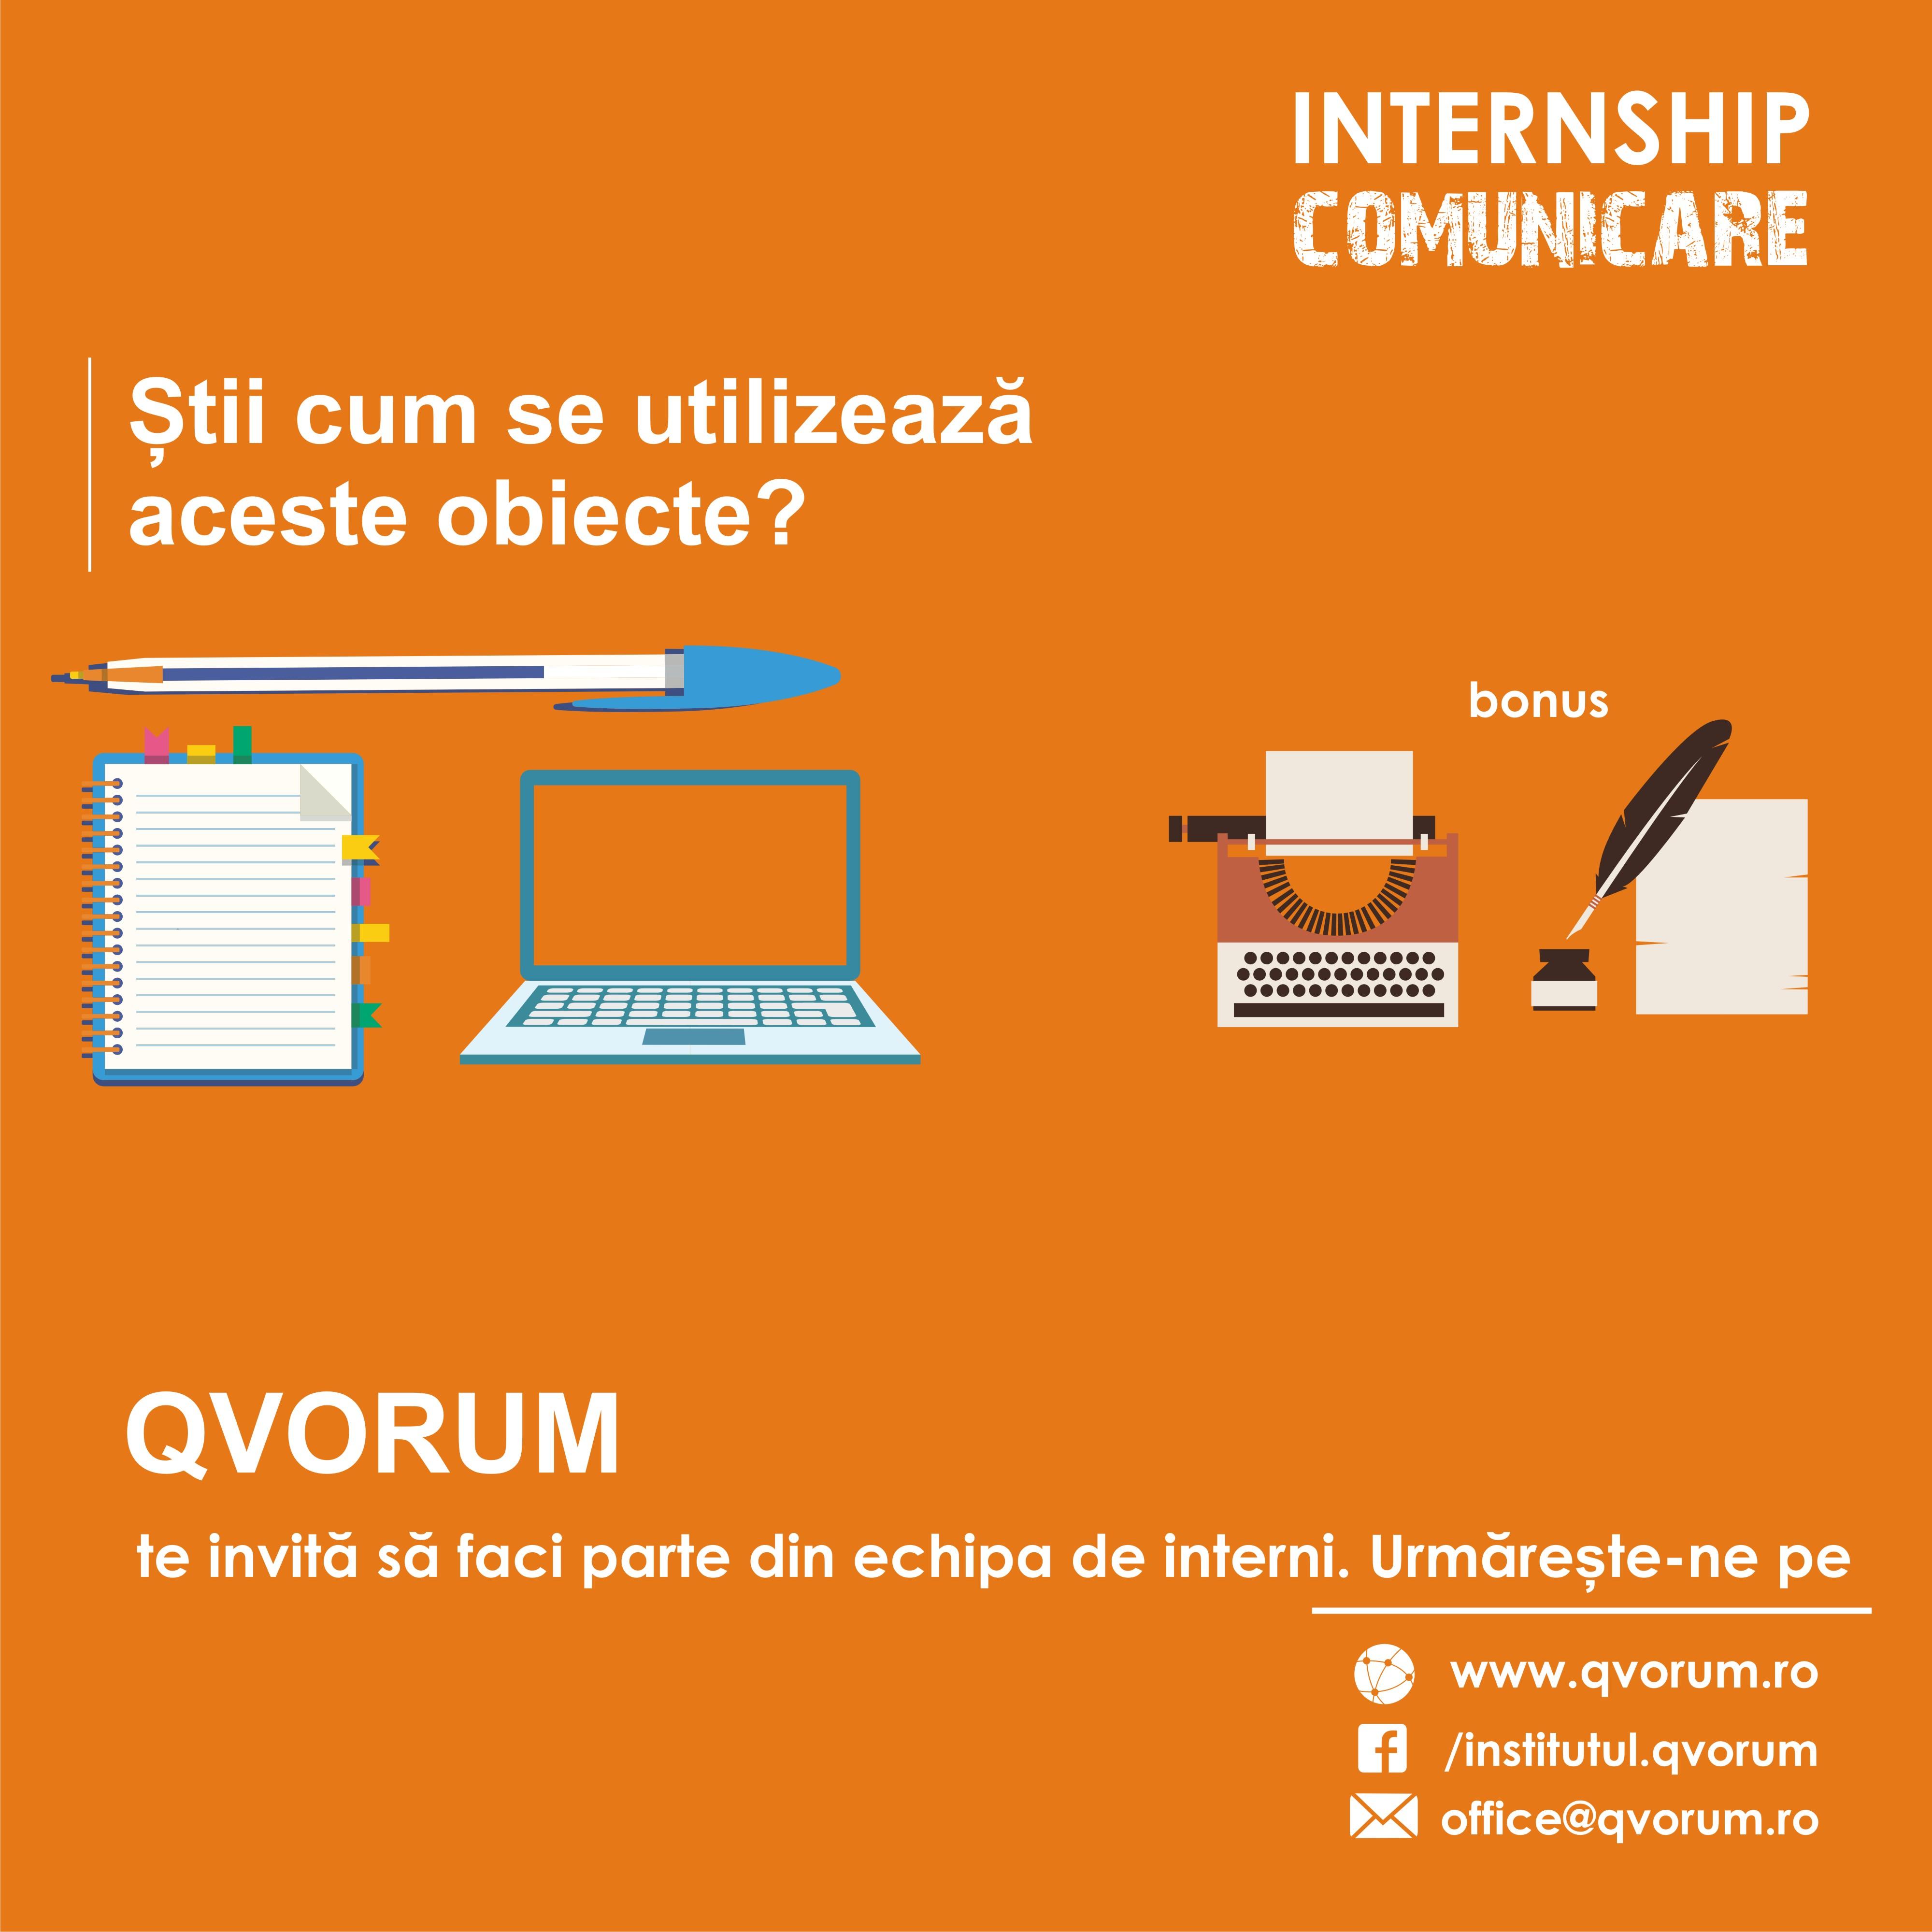 new interns comunicare, PJno3 D#1 16aug16